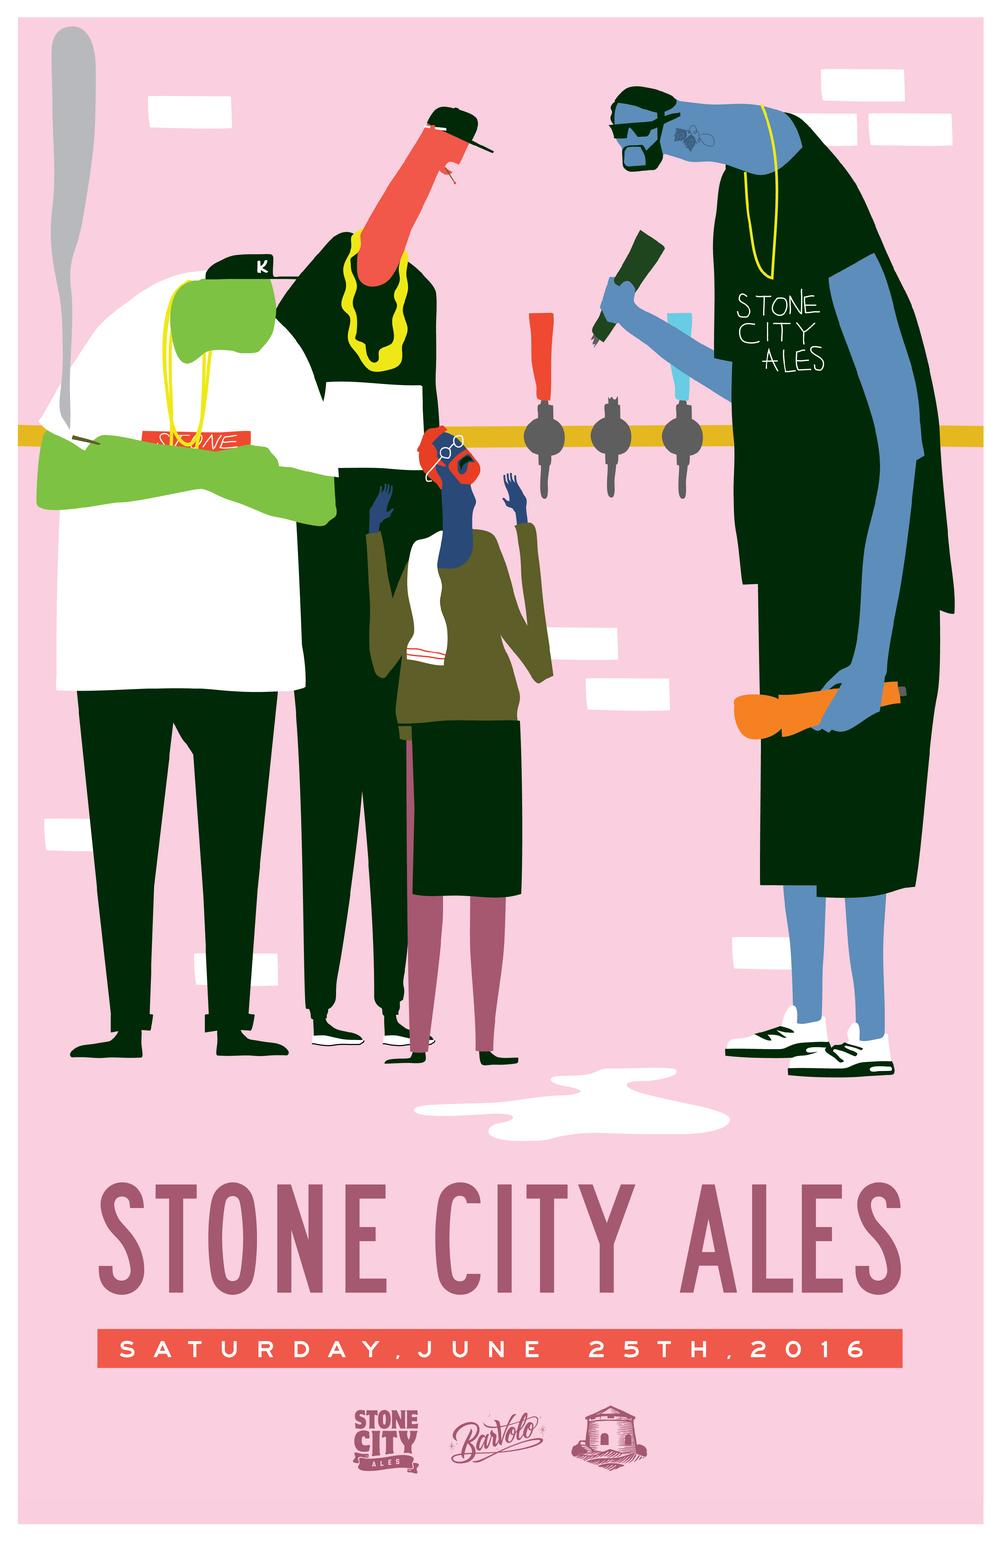 BV-Stone City Ales(web)-01.png